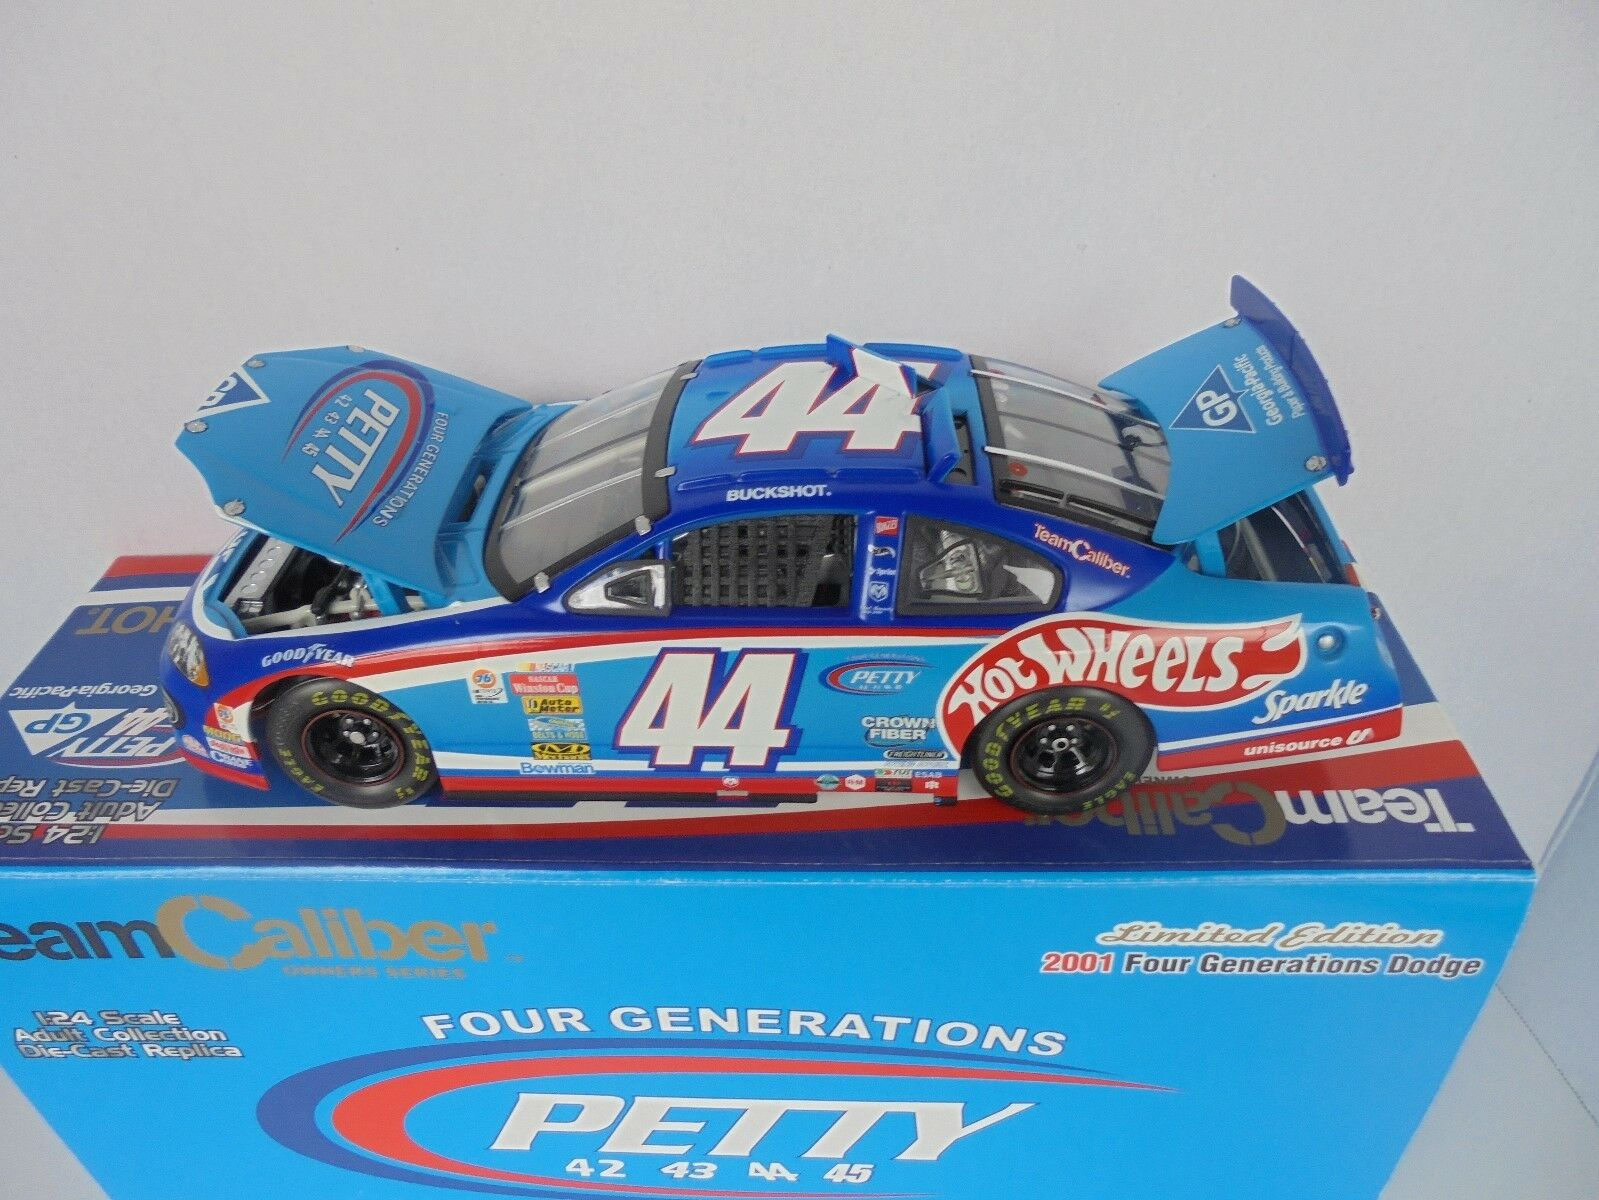 Buckshot Jones  44 Petty 2001 Four Generations Dodge TCOS 1 24th Nascar Diecast